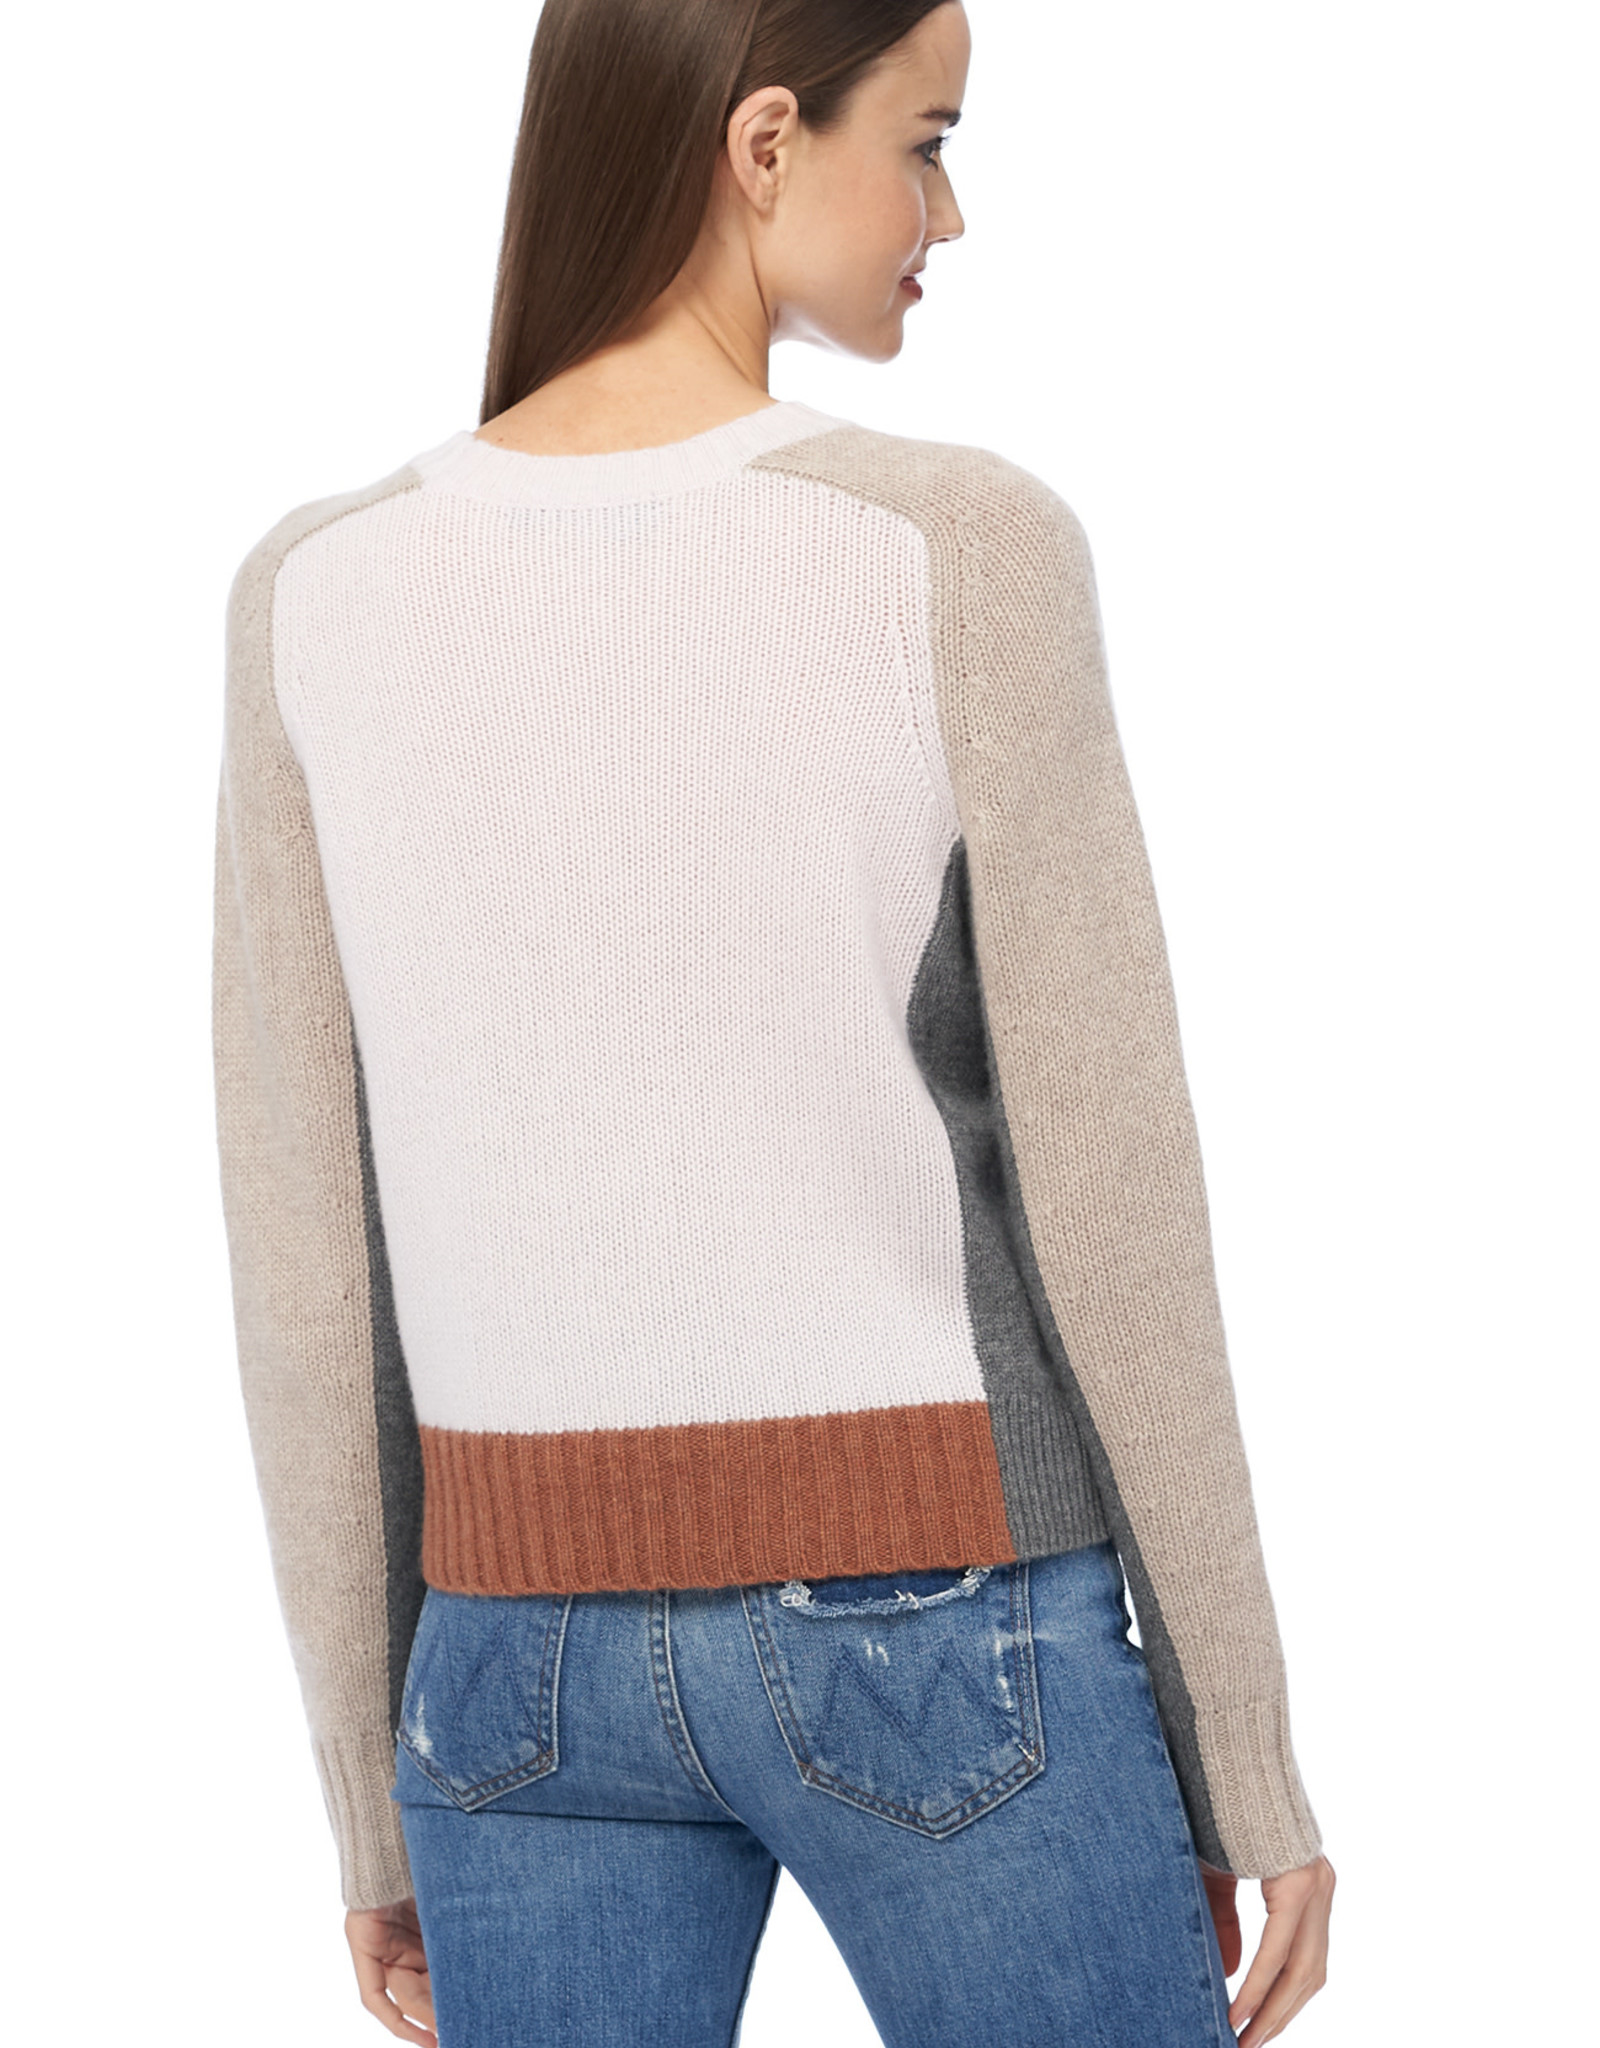 360 Cashmere 360 Cashmere Jean Sweater